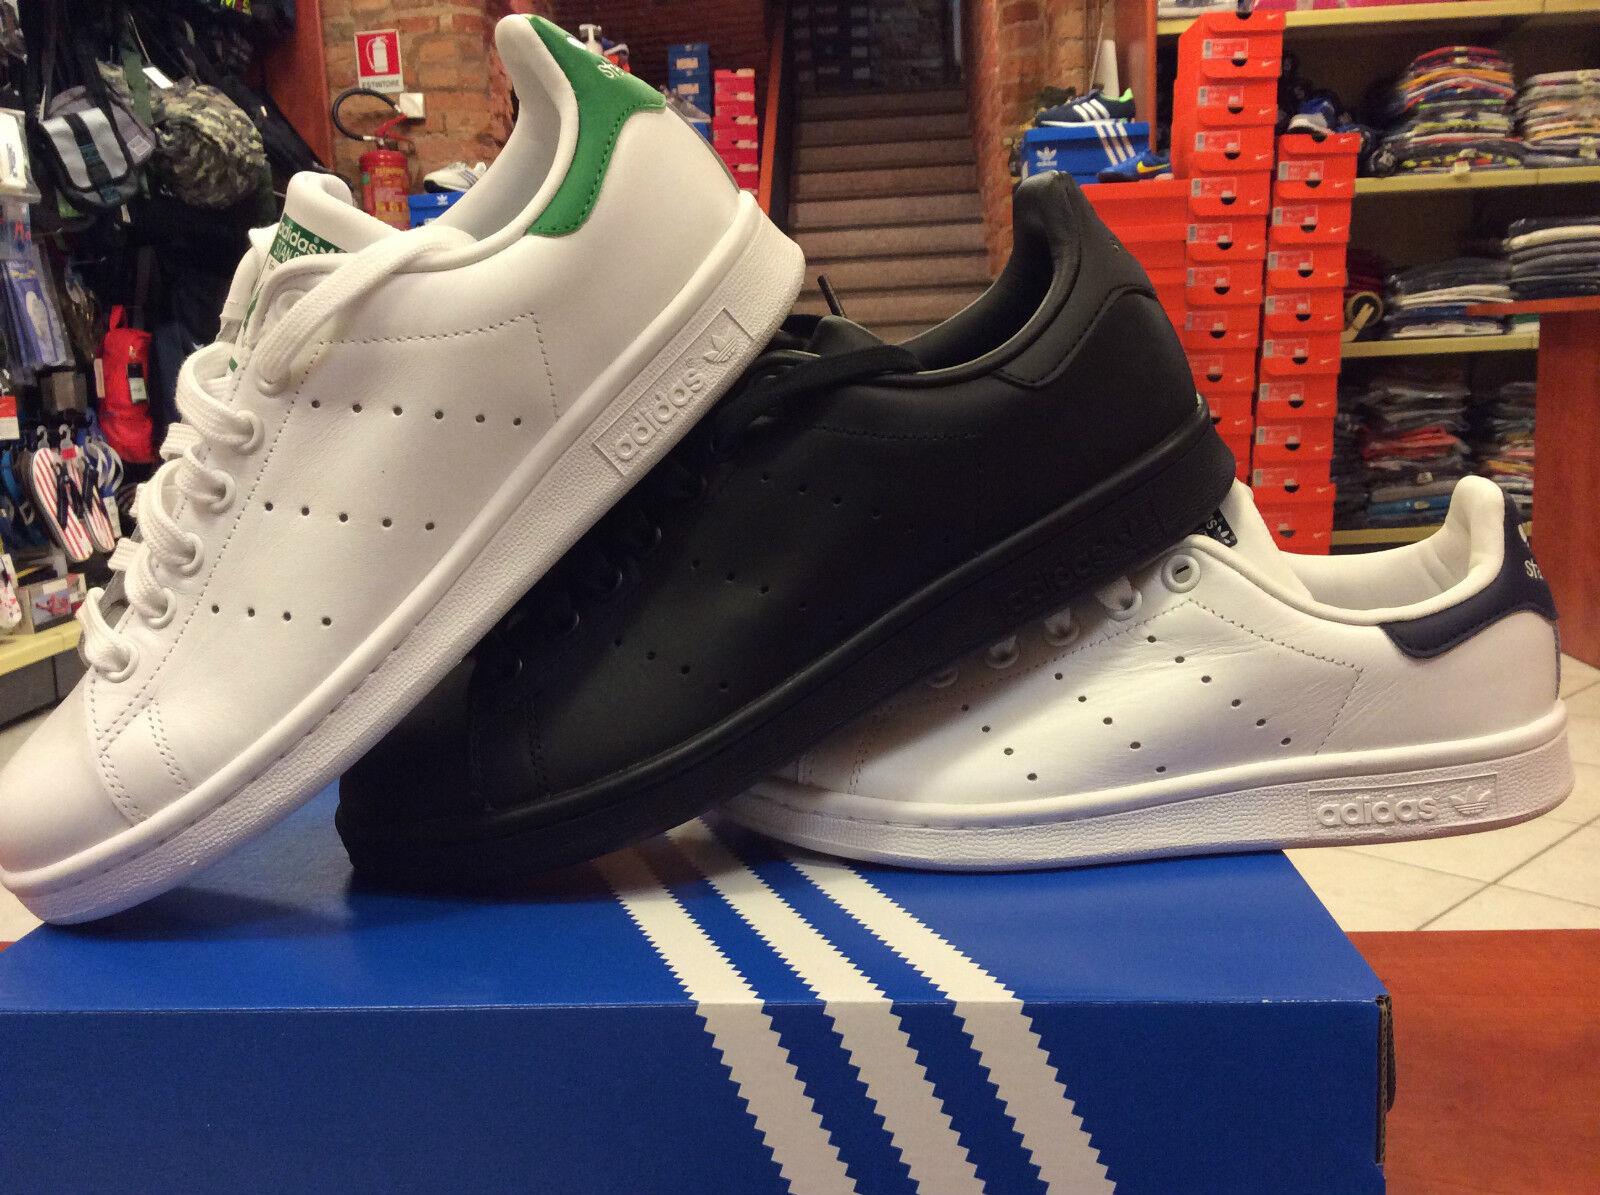 Chaussure adidas Stan smith Art m20324 schwarz bia/grün m20325 bia/blau M20327 schwarz m20324 b07d7d